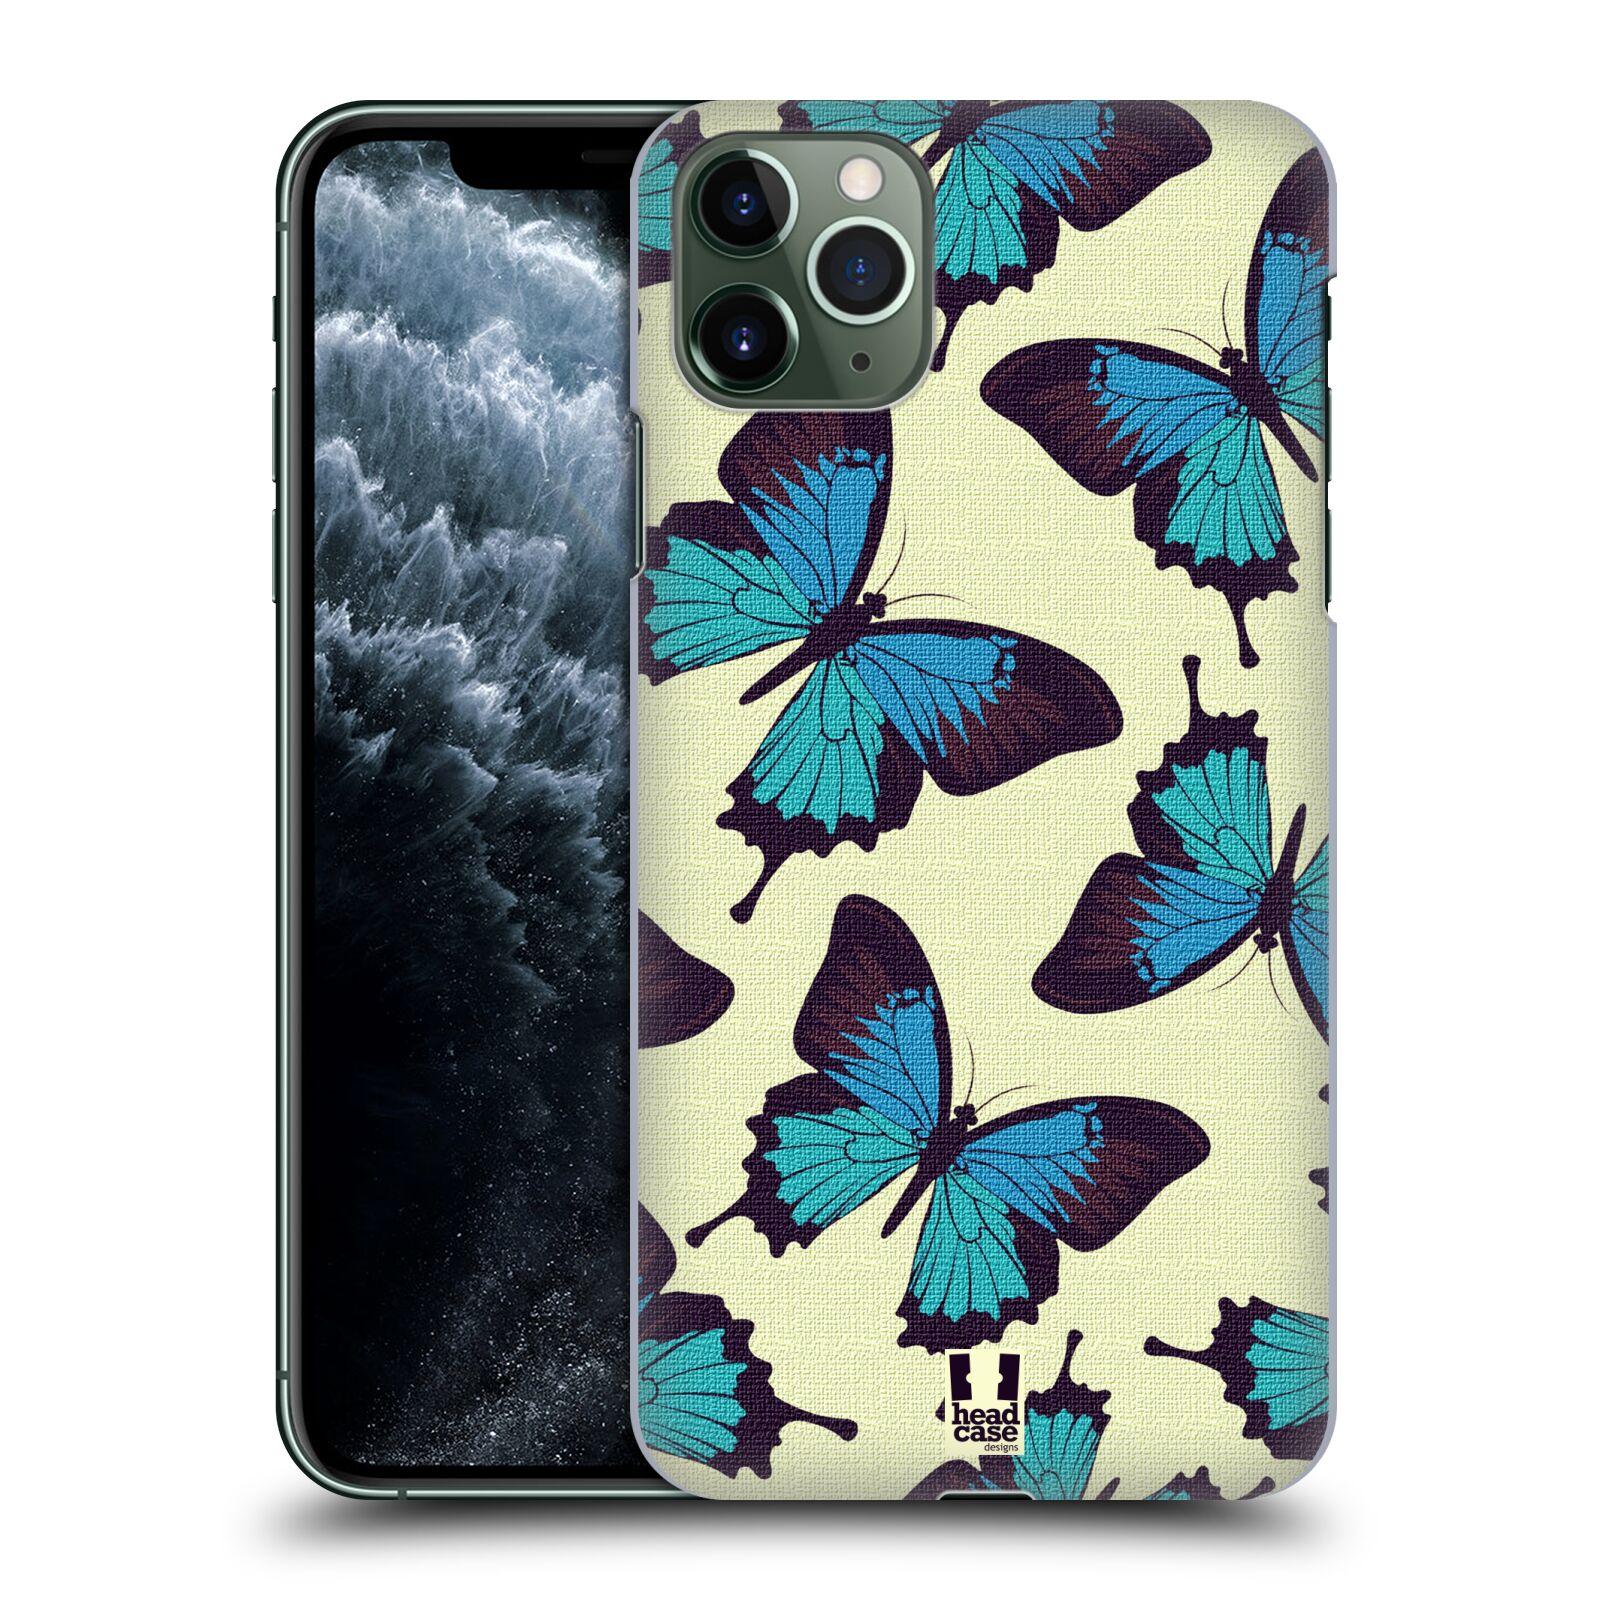 Pouzdro na mobil Apple Iphone 11 PRO MAX - HEAD CASE - vzor Motýlci modrá